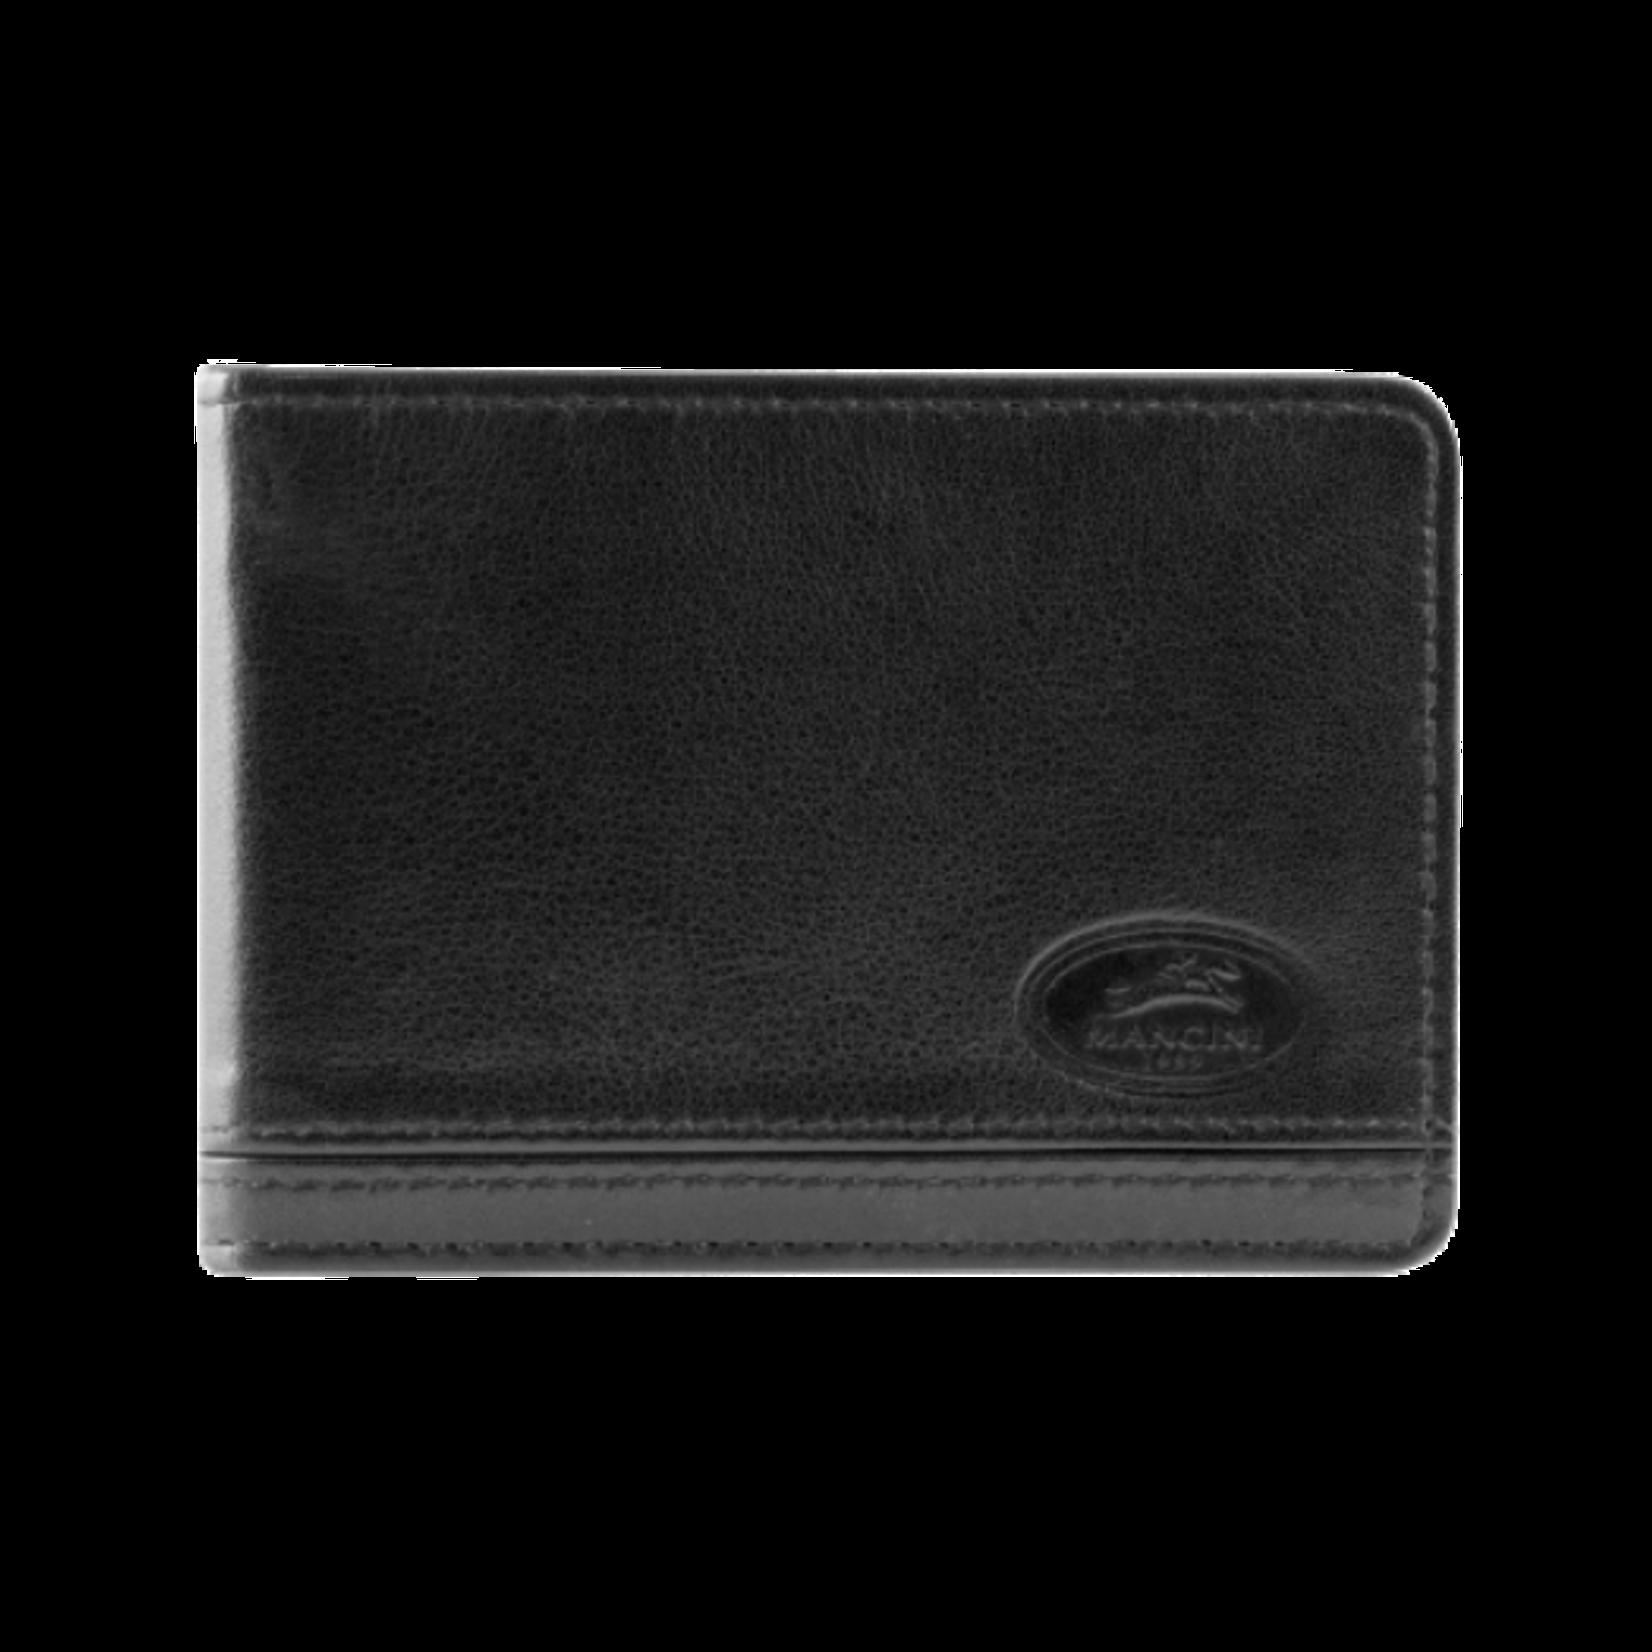 MANCINI RFID DELUXE BILL CLIP Black